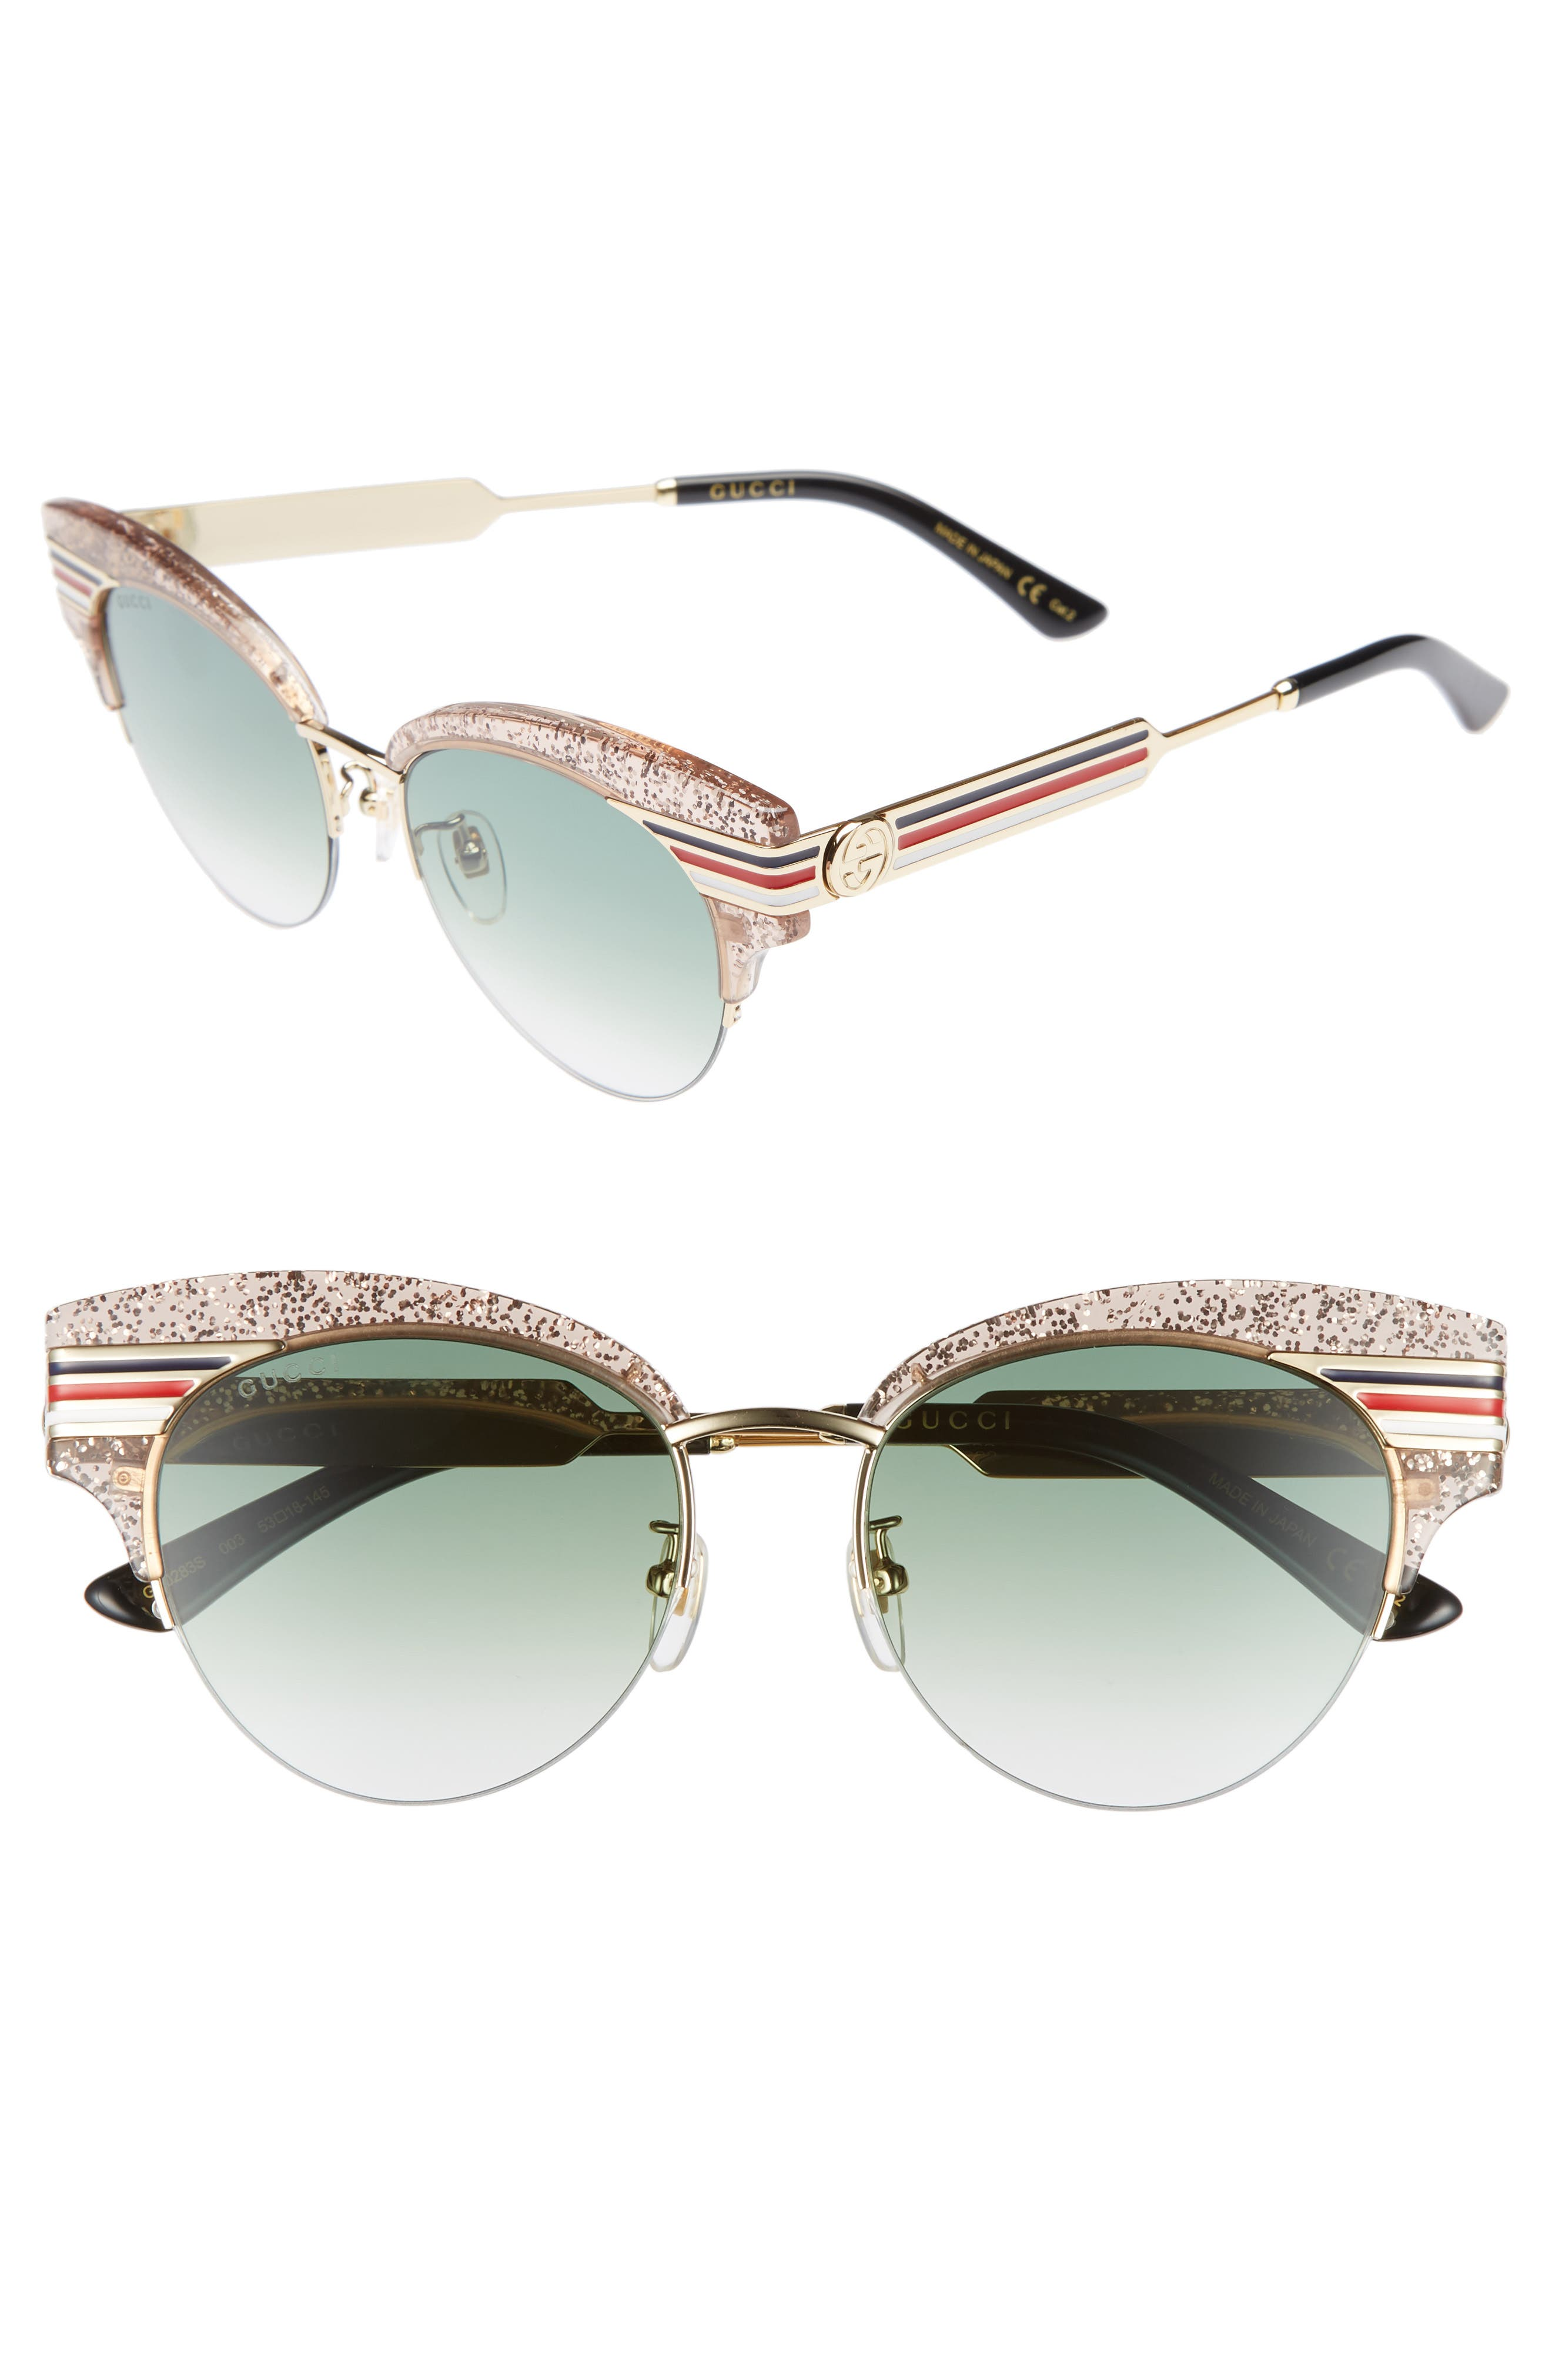 53mm Cat Eye Sunglasses,                         Main,                         color, NUDE/ GOLD/ BLACK